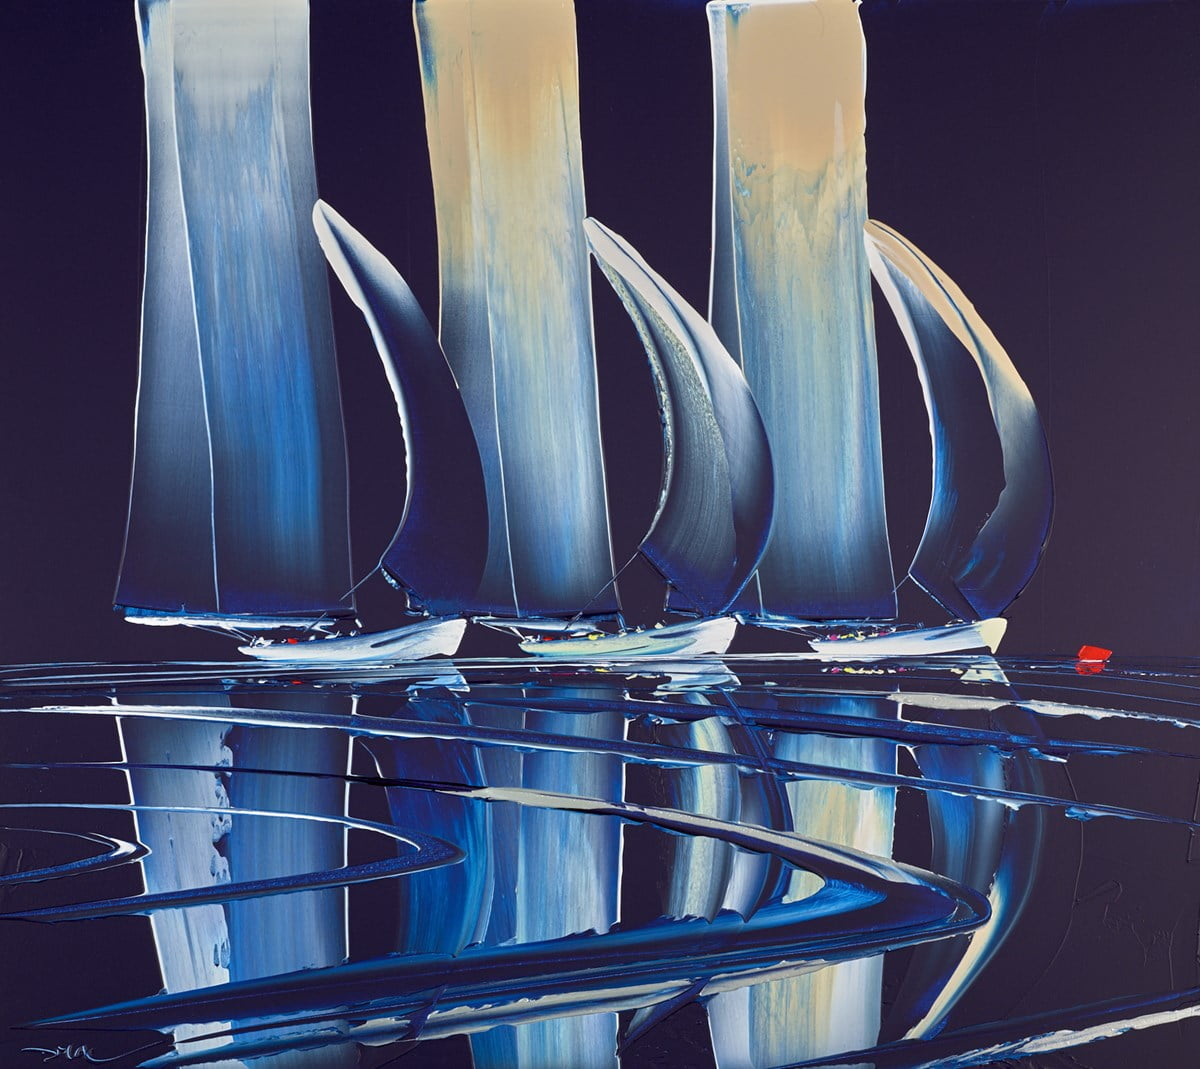 Midnight on the Water ~ Duncan MacGregor